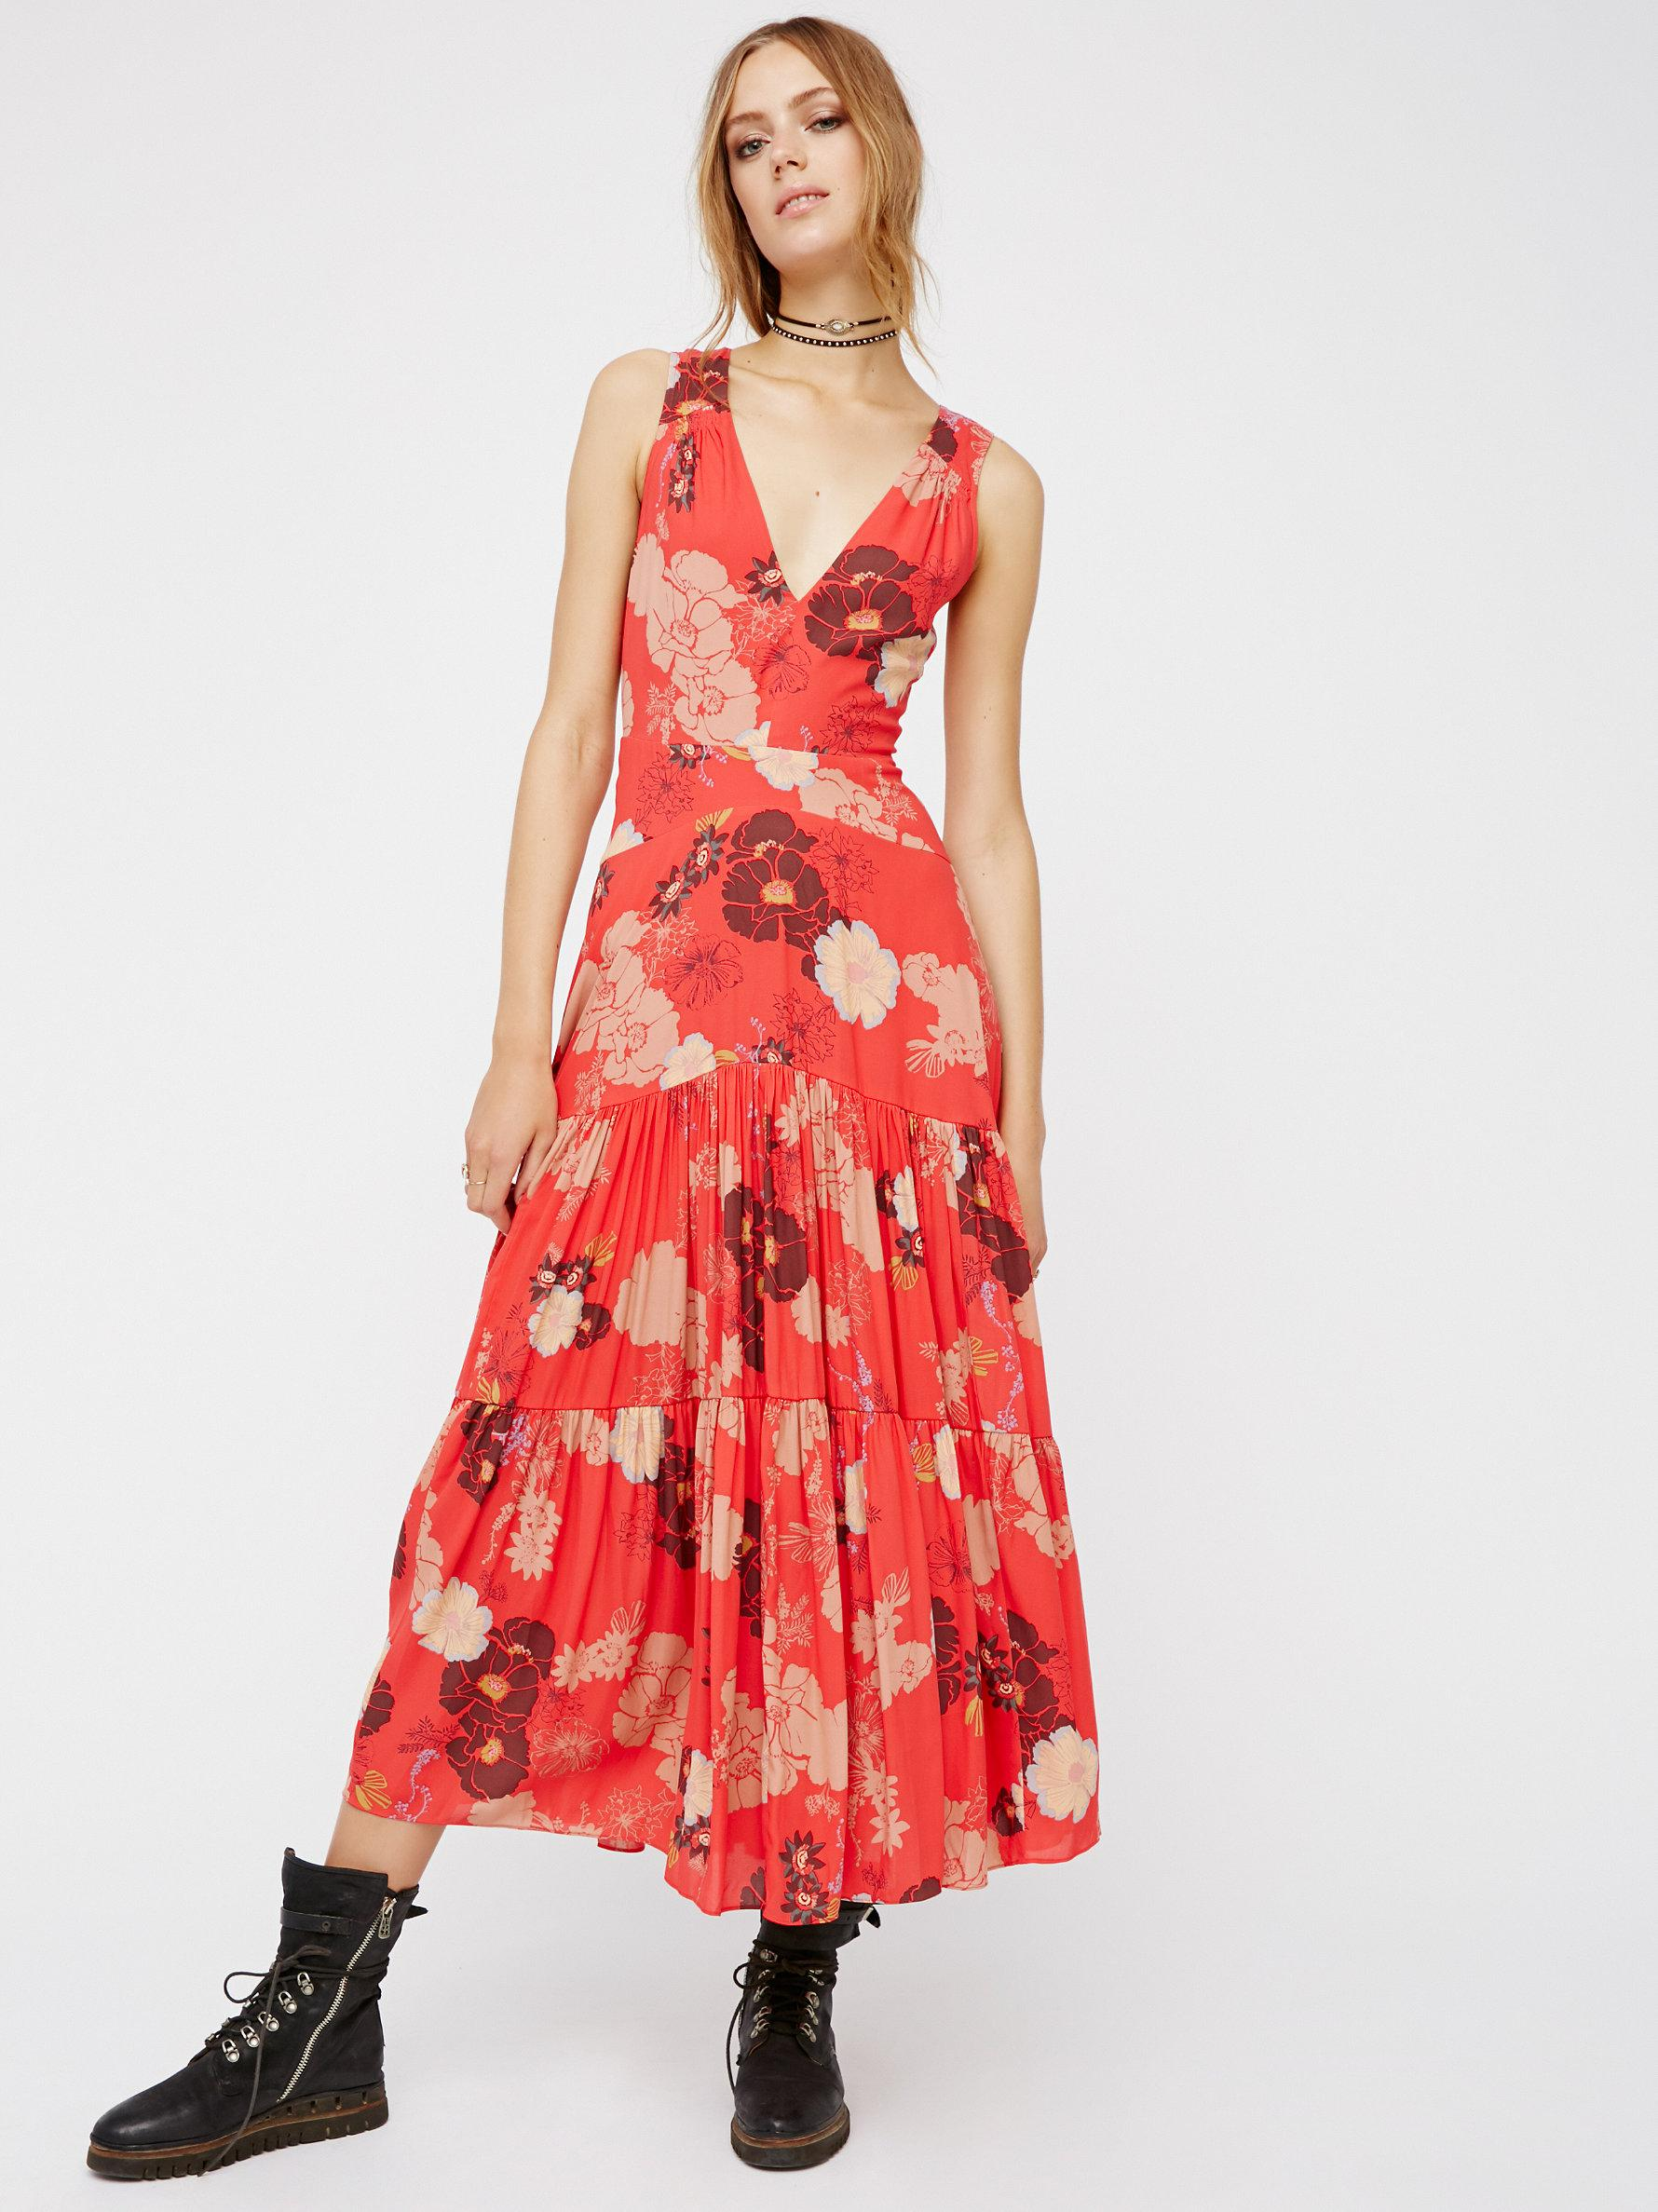 Cherry red maxi dress